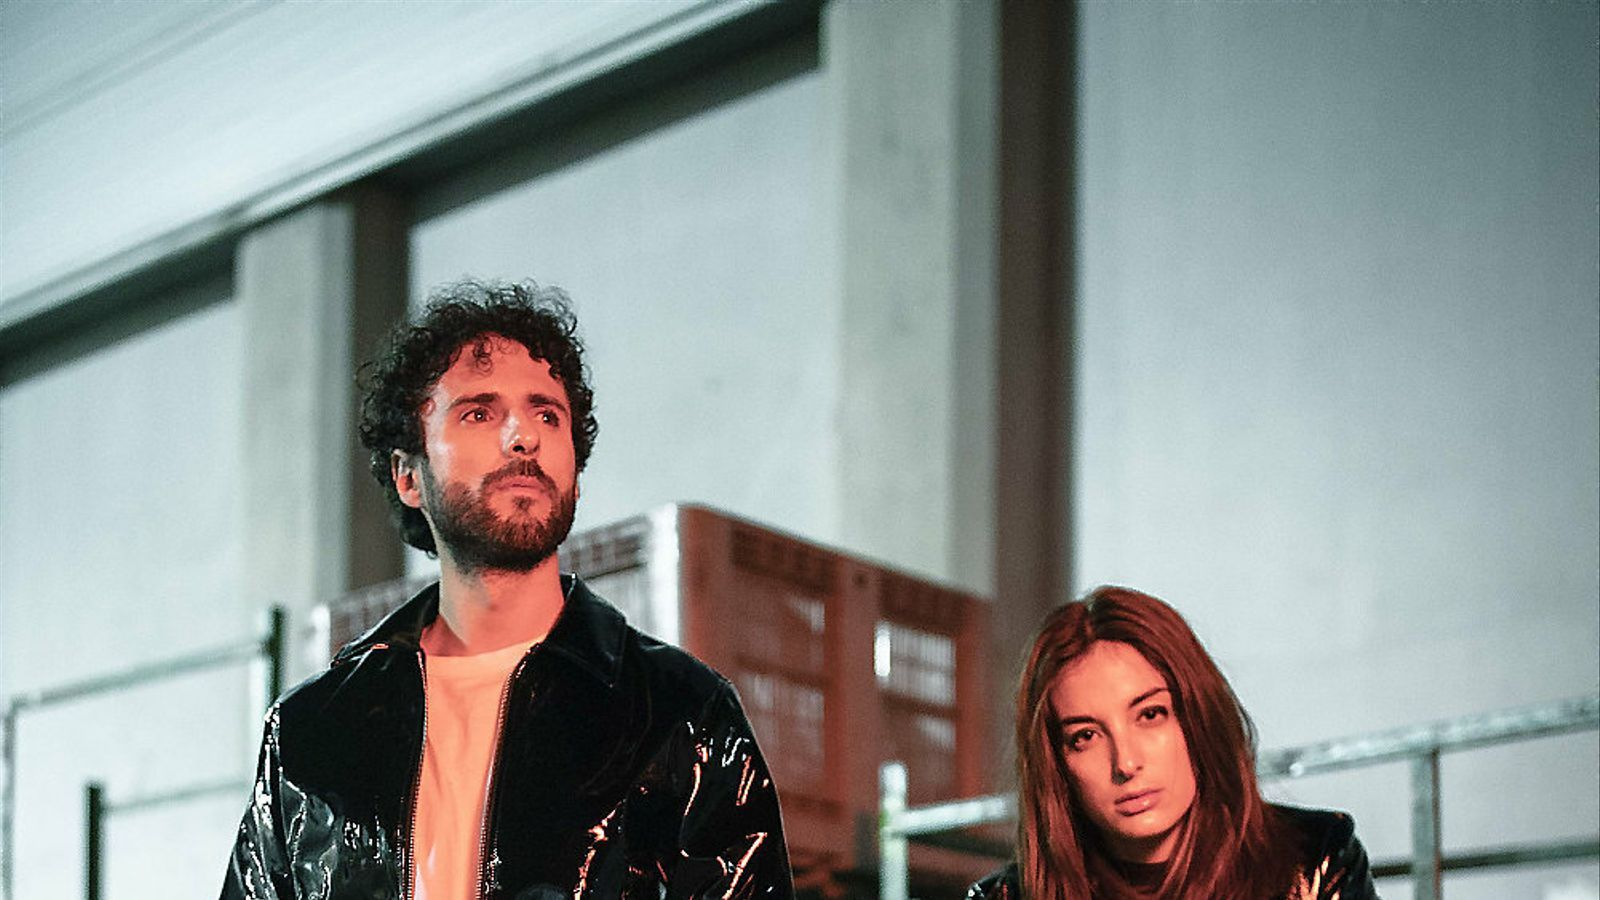 El napolità Sergio Salvi i la madrilenya Sandra de la Portilla formen el duo de pop electrònic Delaporte.